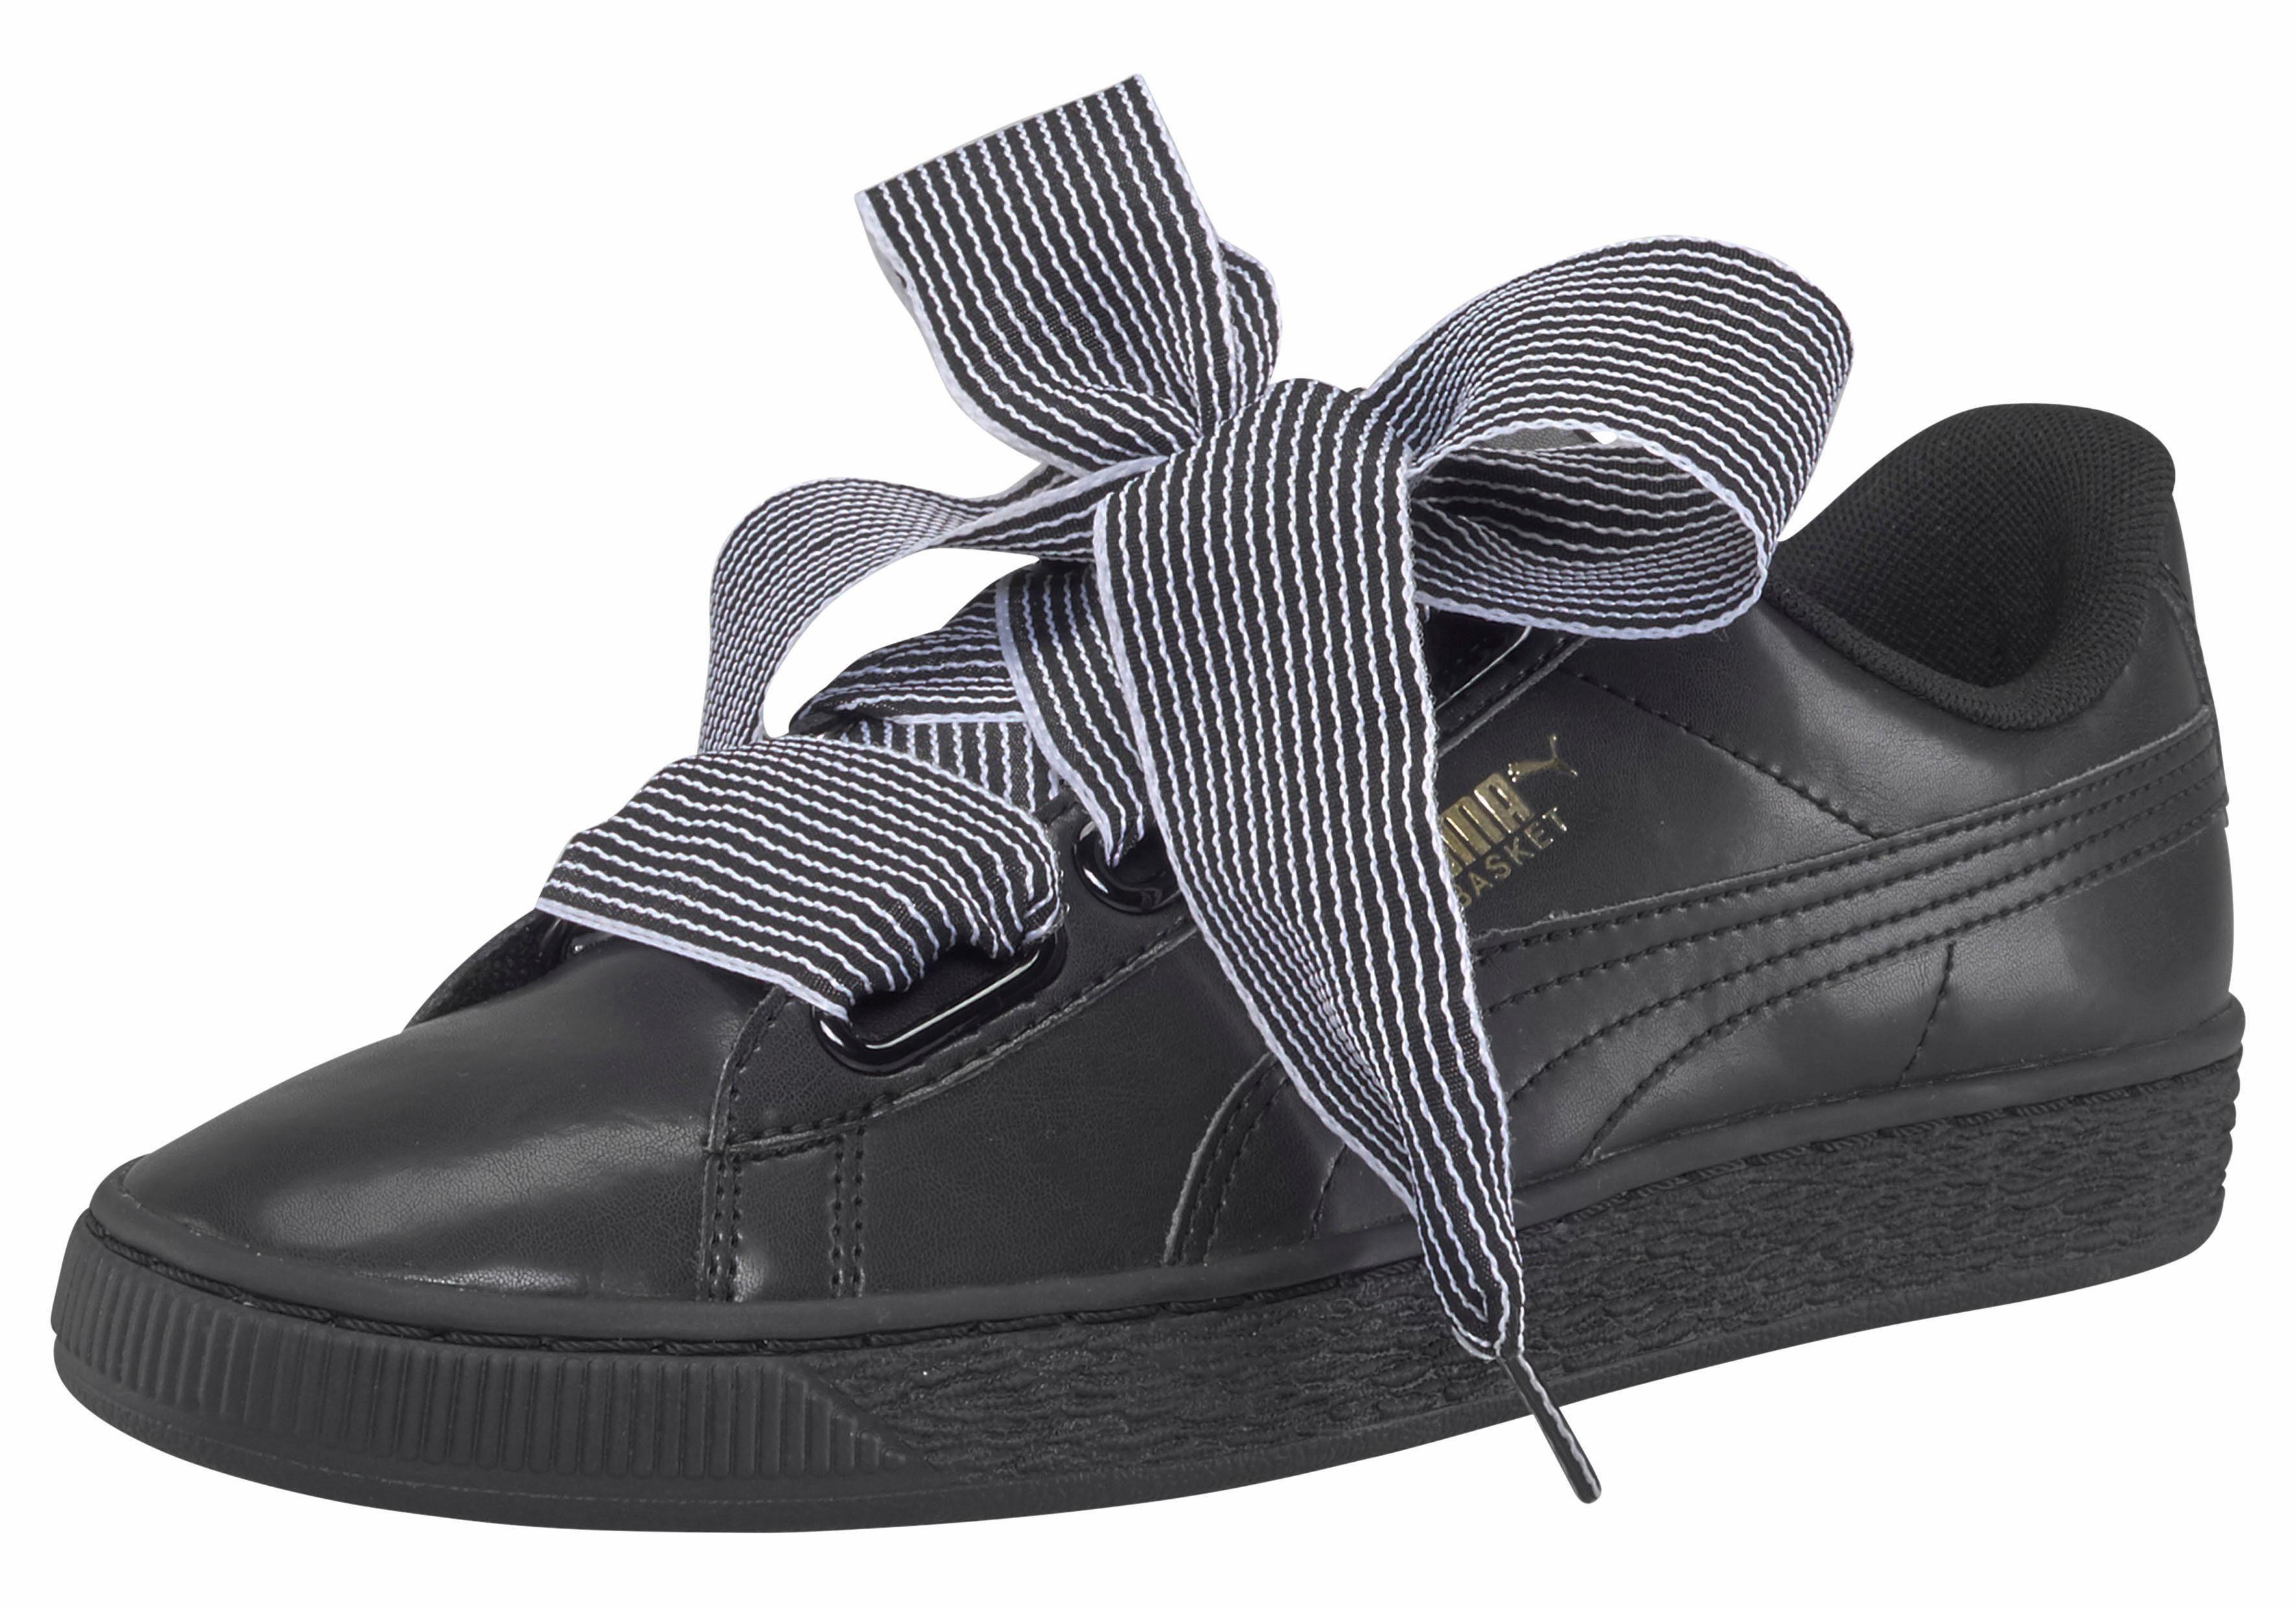 Pumas Panier Coeur Perf Femmes Sneaker Gomme, 8,0 Au Royaume-uni - 42,0 Eu